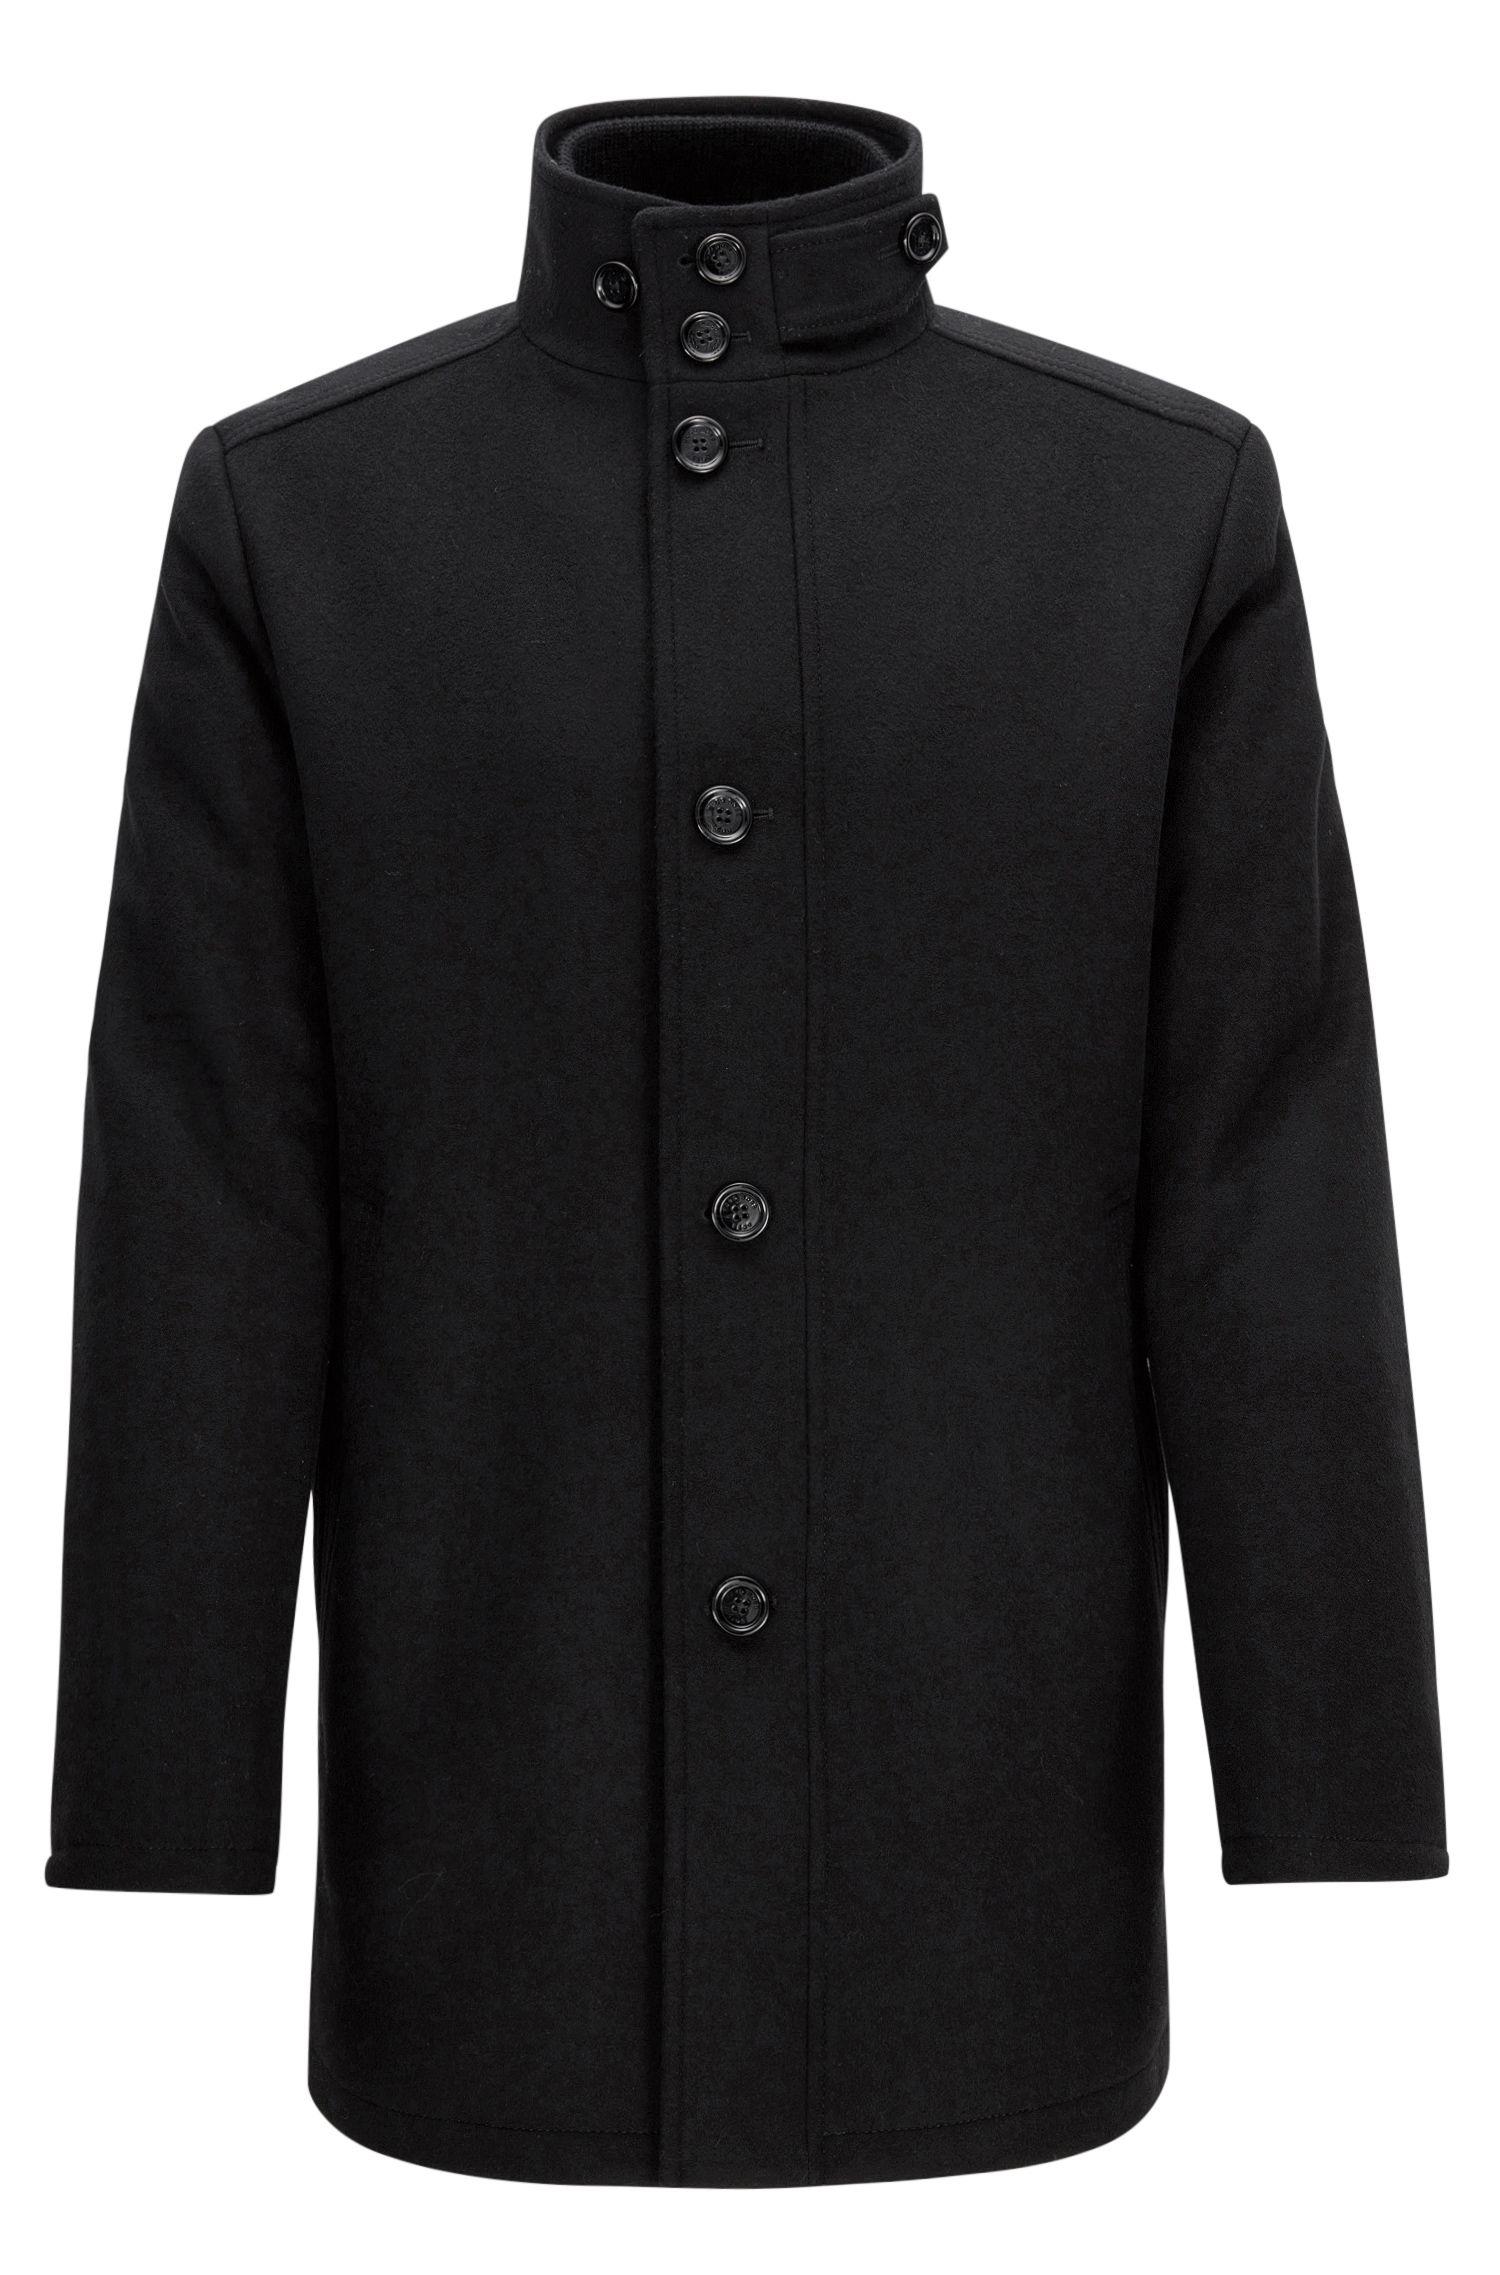 Stralingblokkerende mantel van wol en kasjmier